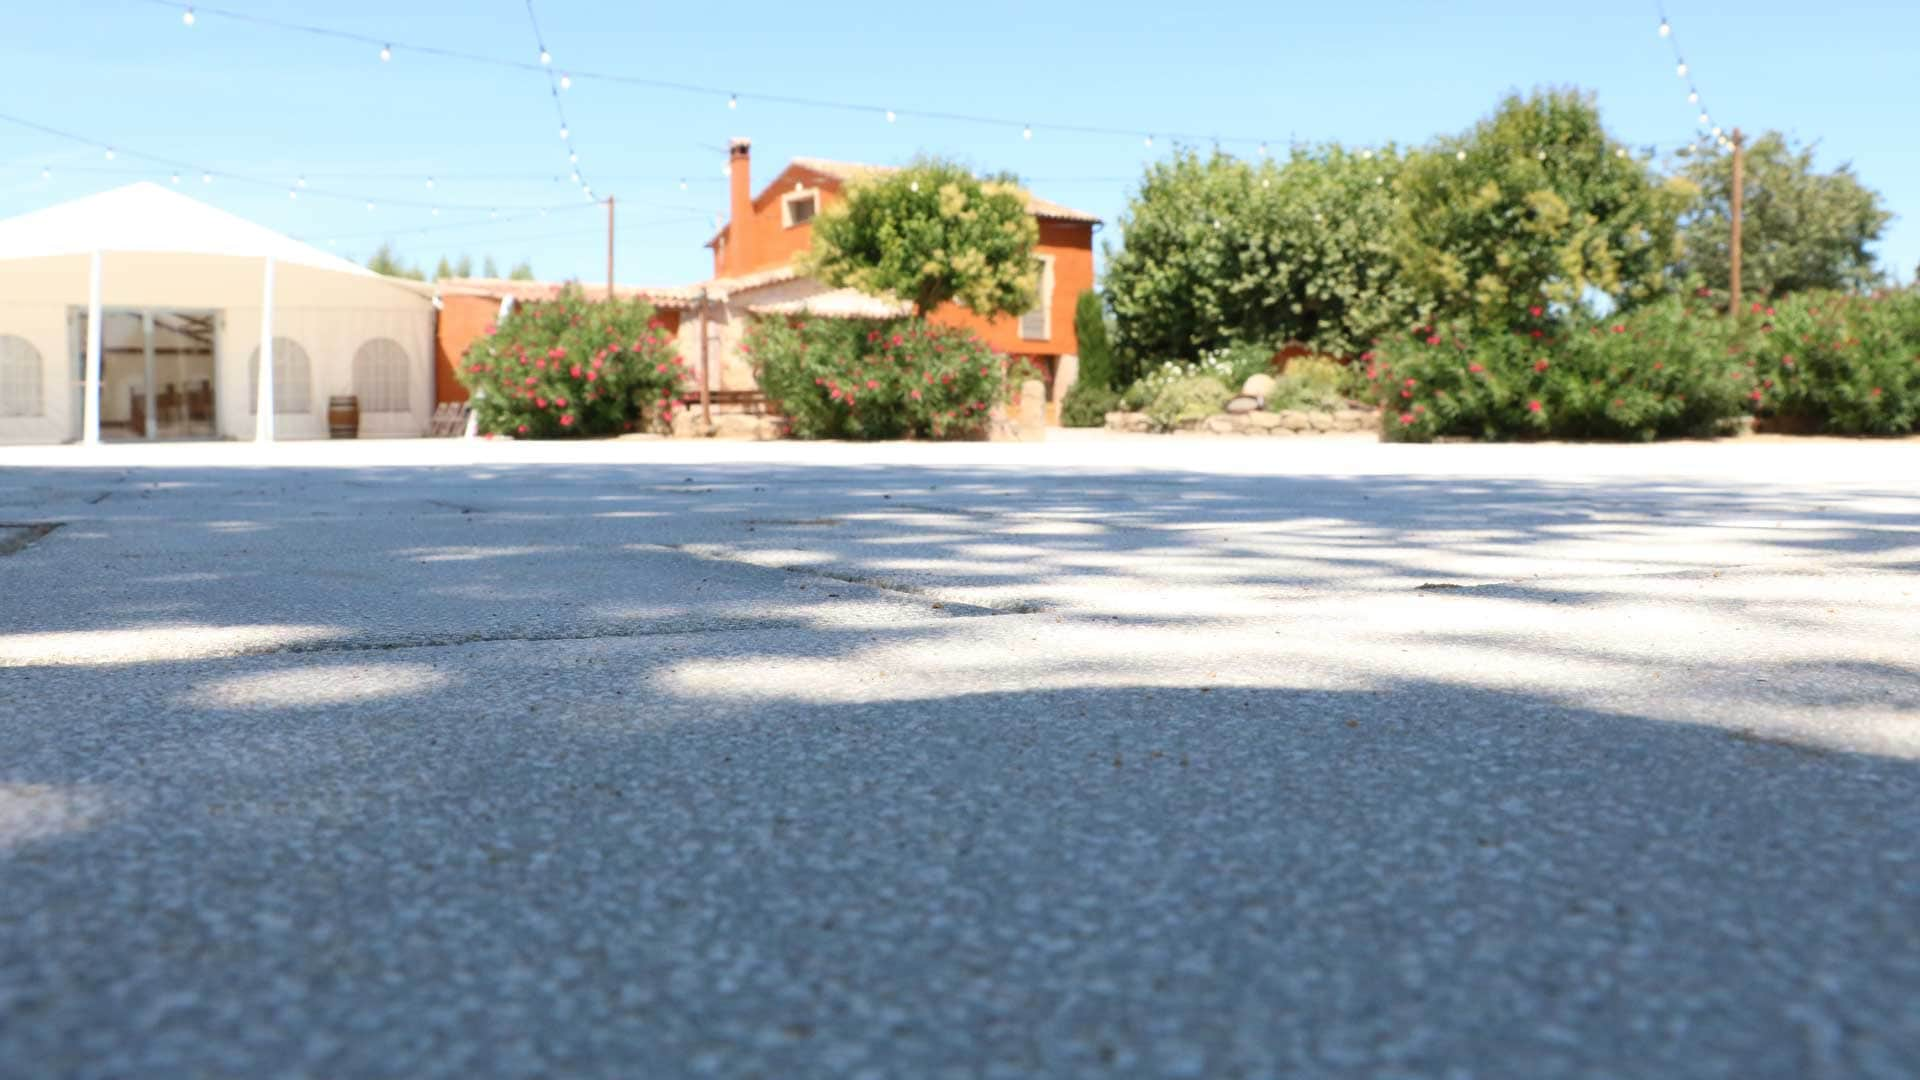 pujol-paviments-terratzo-exterior-masia-3